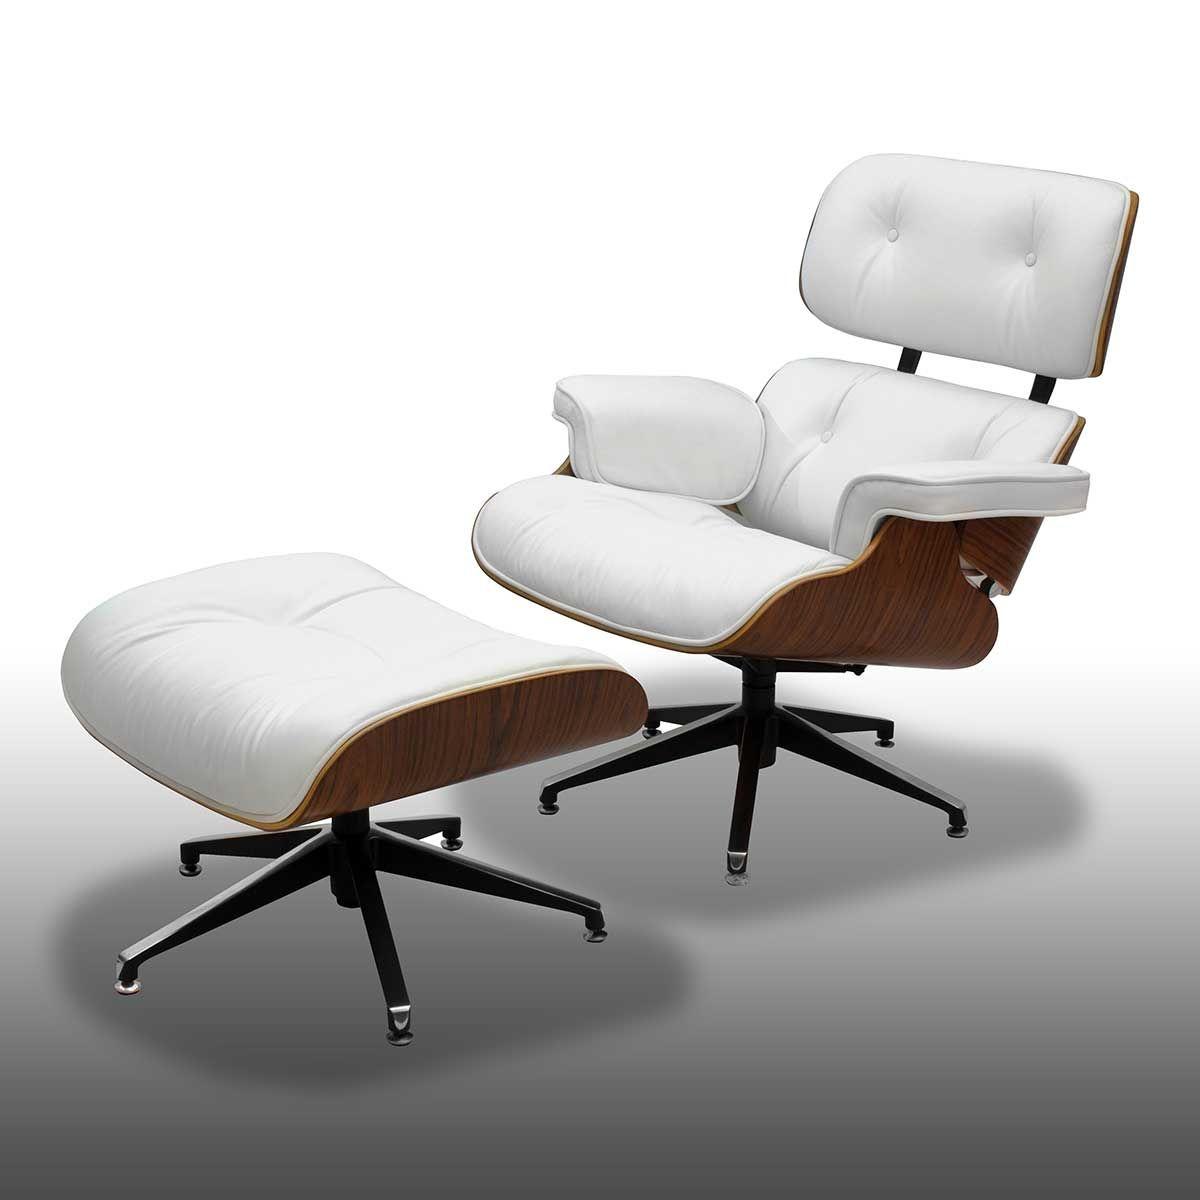 Ibacana - Poltrona Charles Eames BR | Charles Eames | Pinterest ...